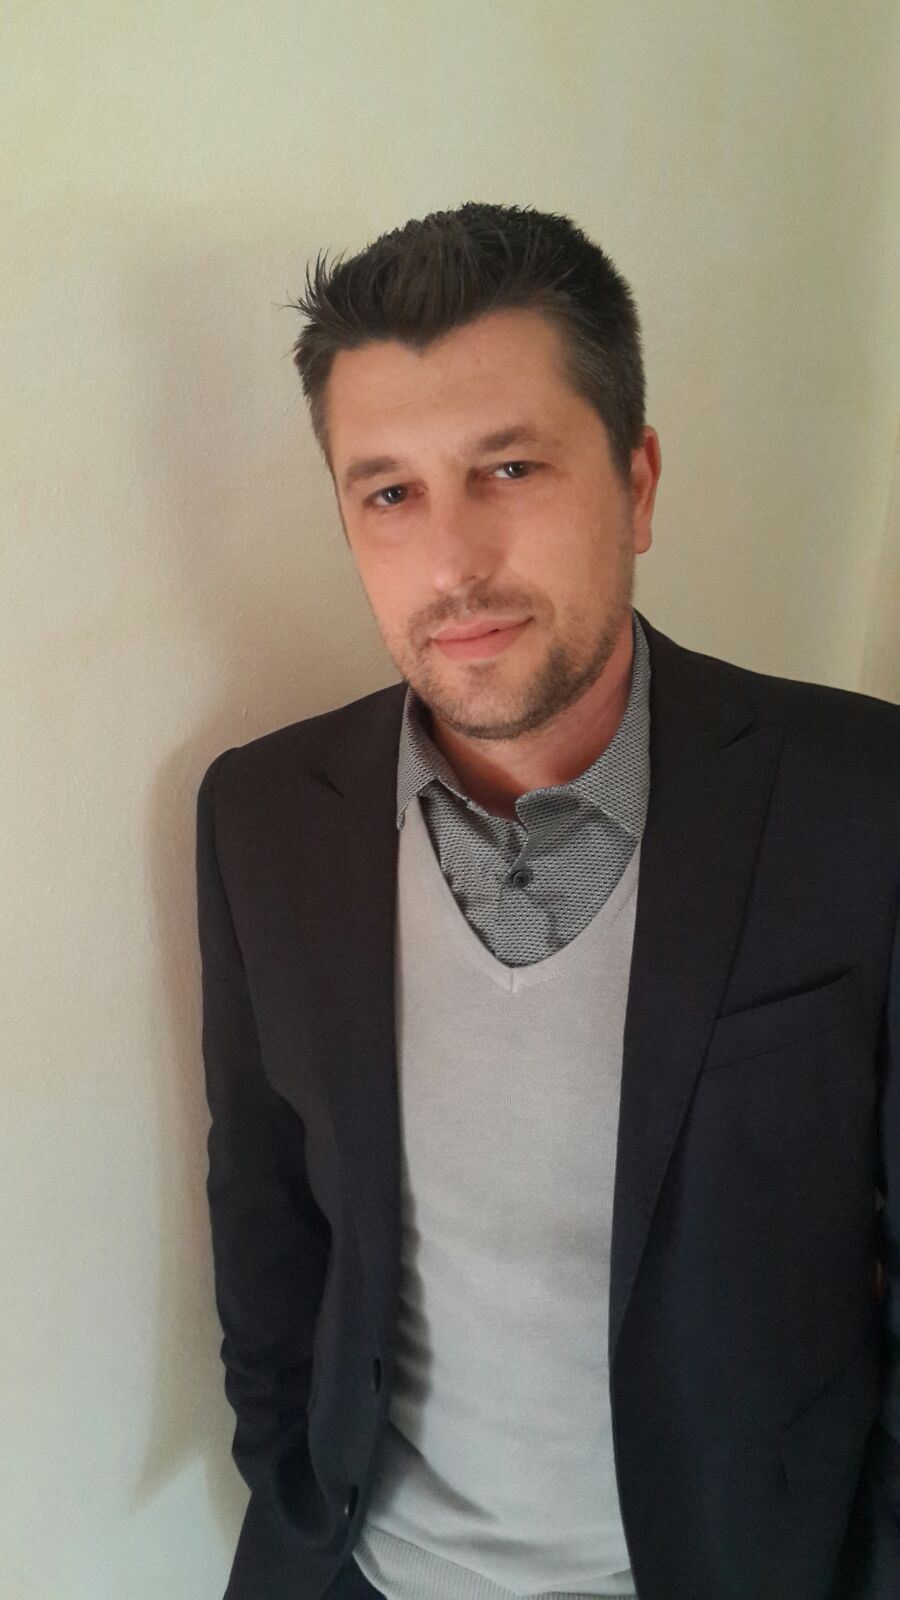 Vincenzo Fedele